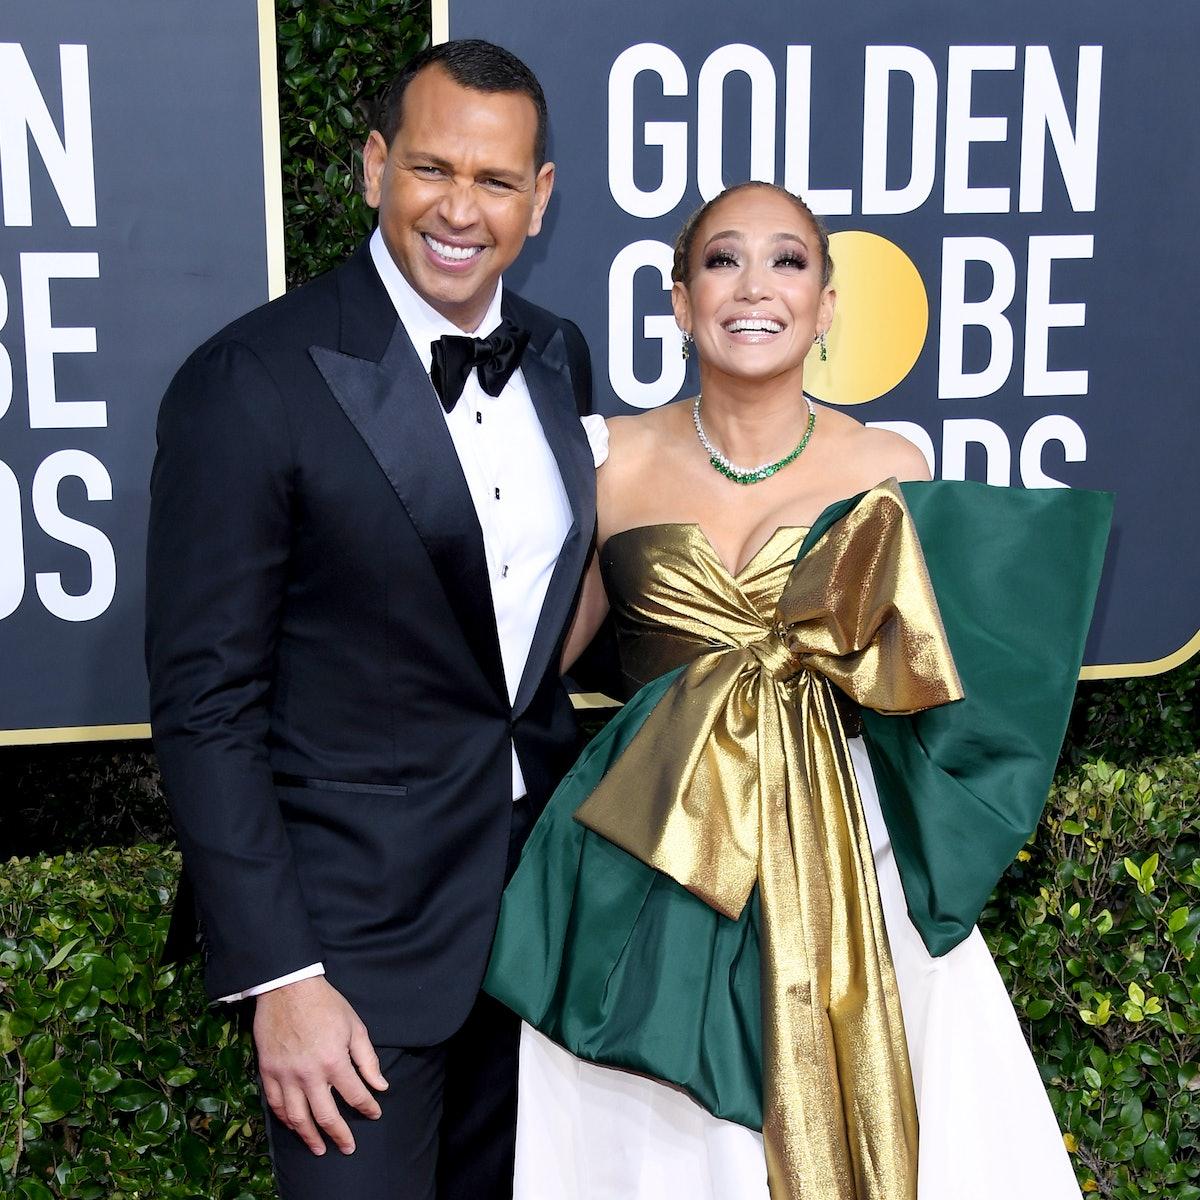 BEVERLY HILLS, CALIFORNIA - JANUARY 05: (L-R) Alex Rodriguez and Jennifer Lopez attend the 77th Annu...